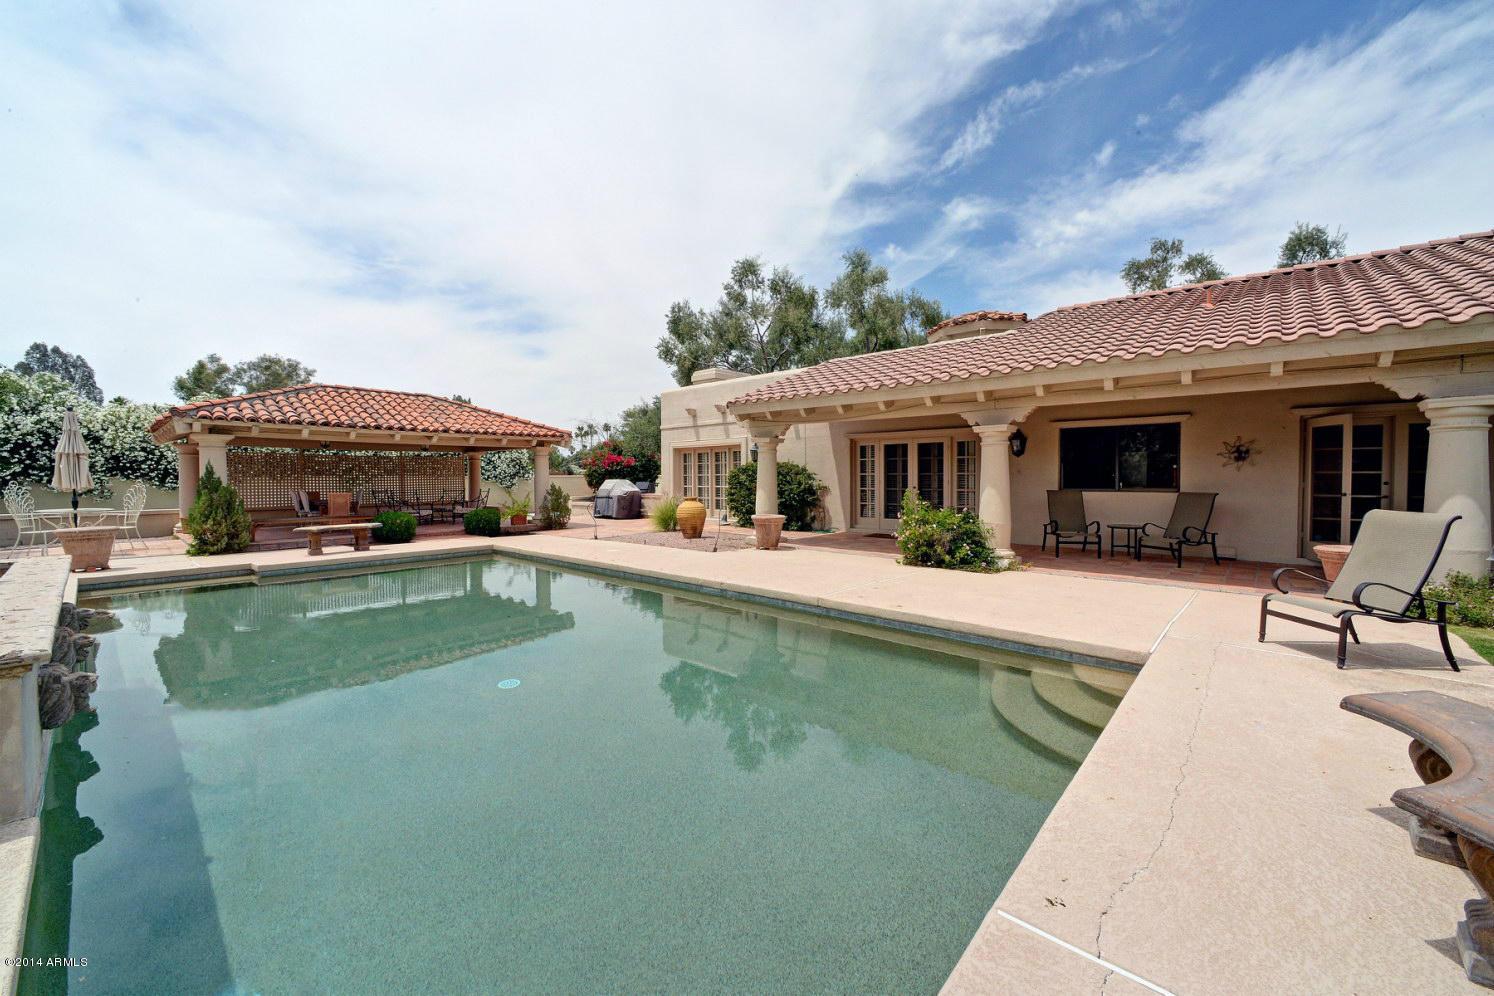 7501 E Northern Ave, Scottsdale | $1,075,000